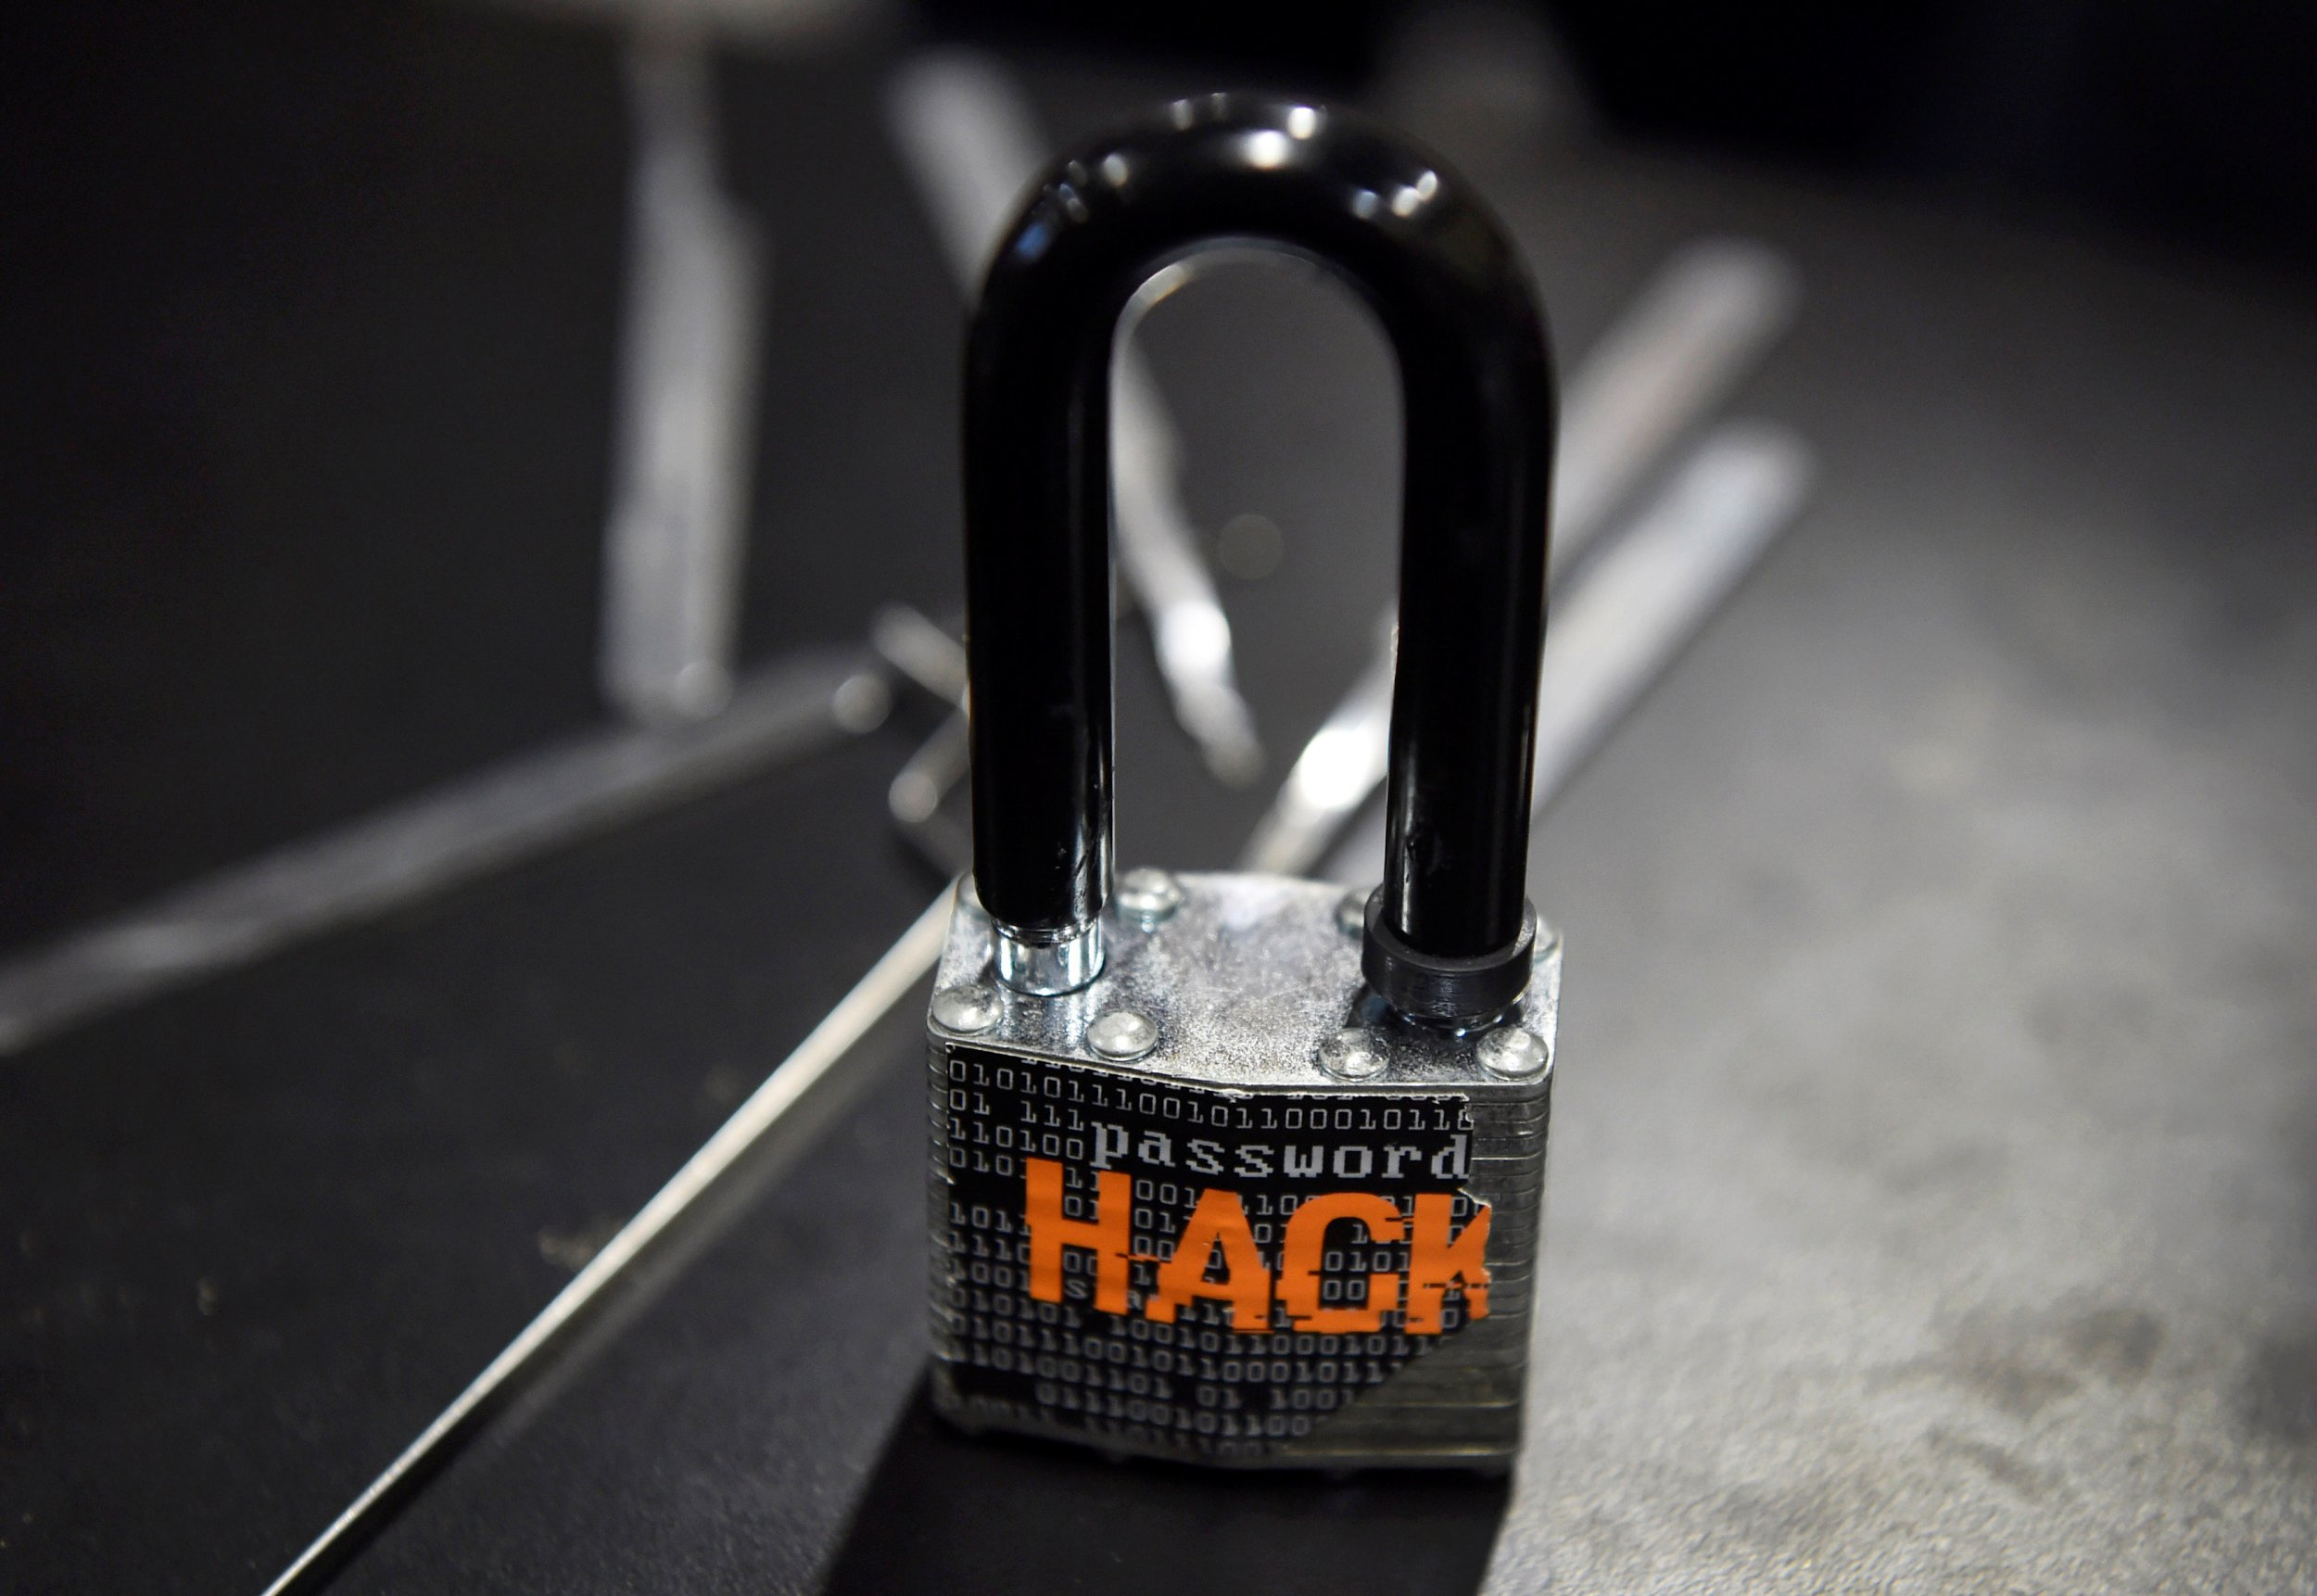 mirai botnet hacks securifi IoT